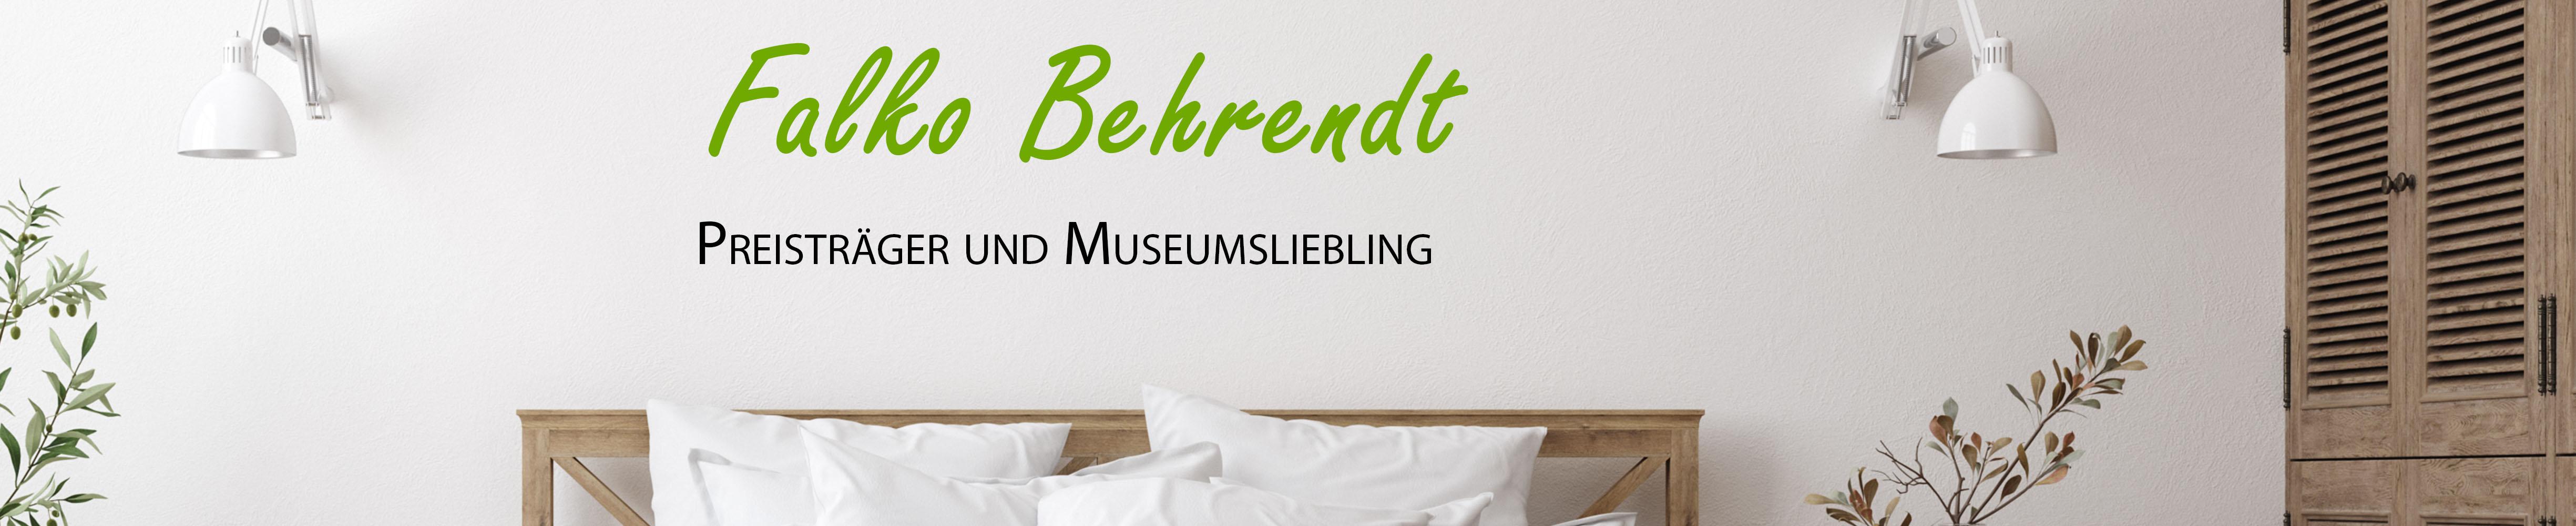 Kategorie: Falko Behrendt